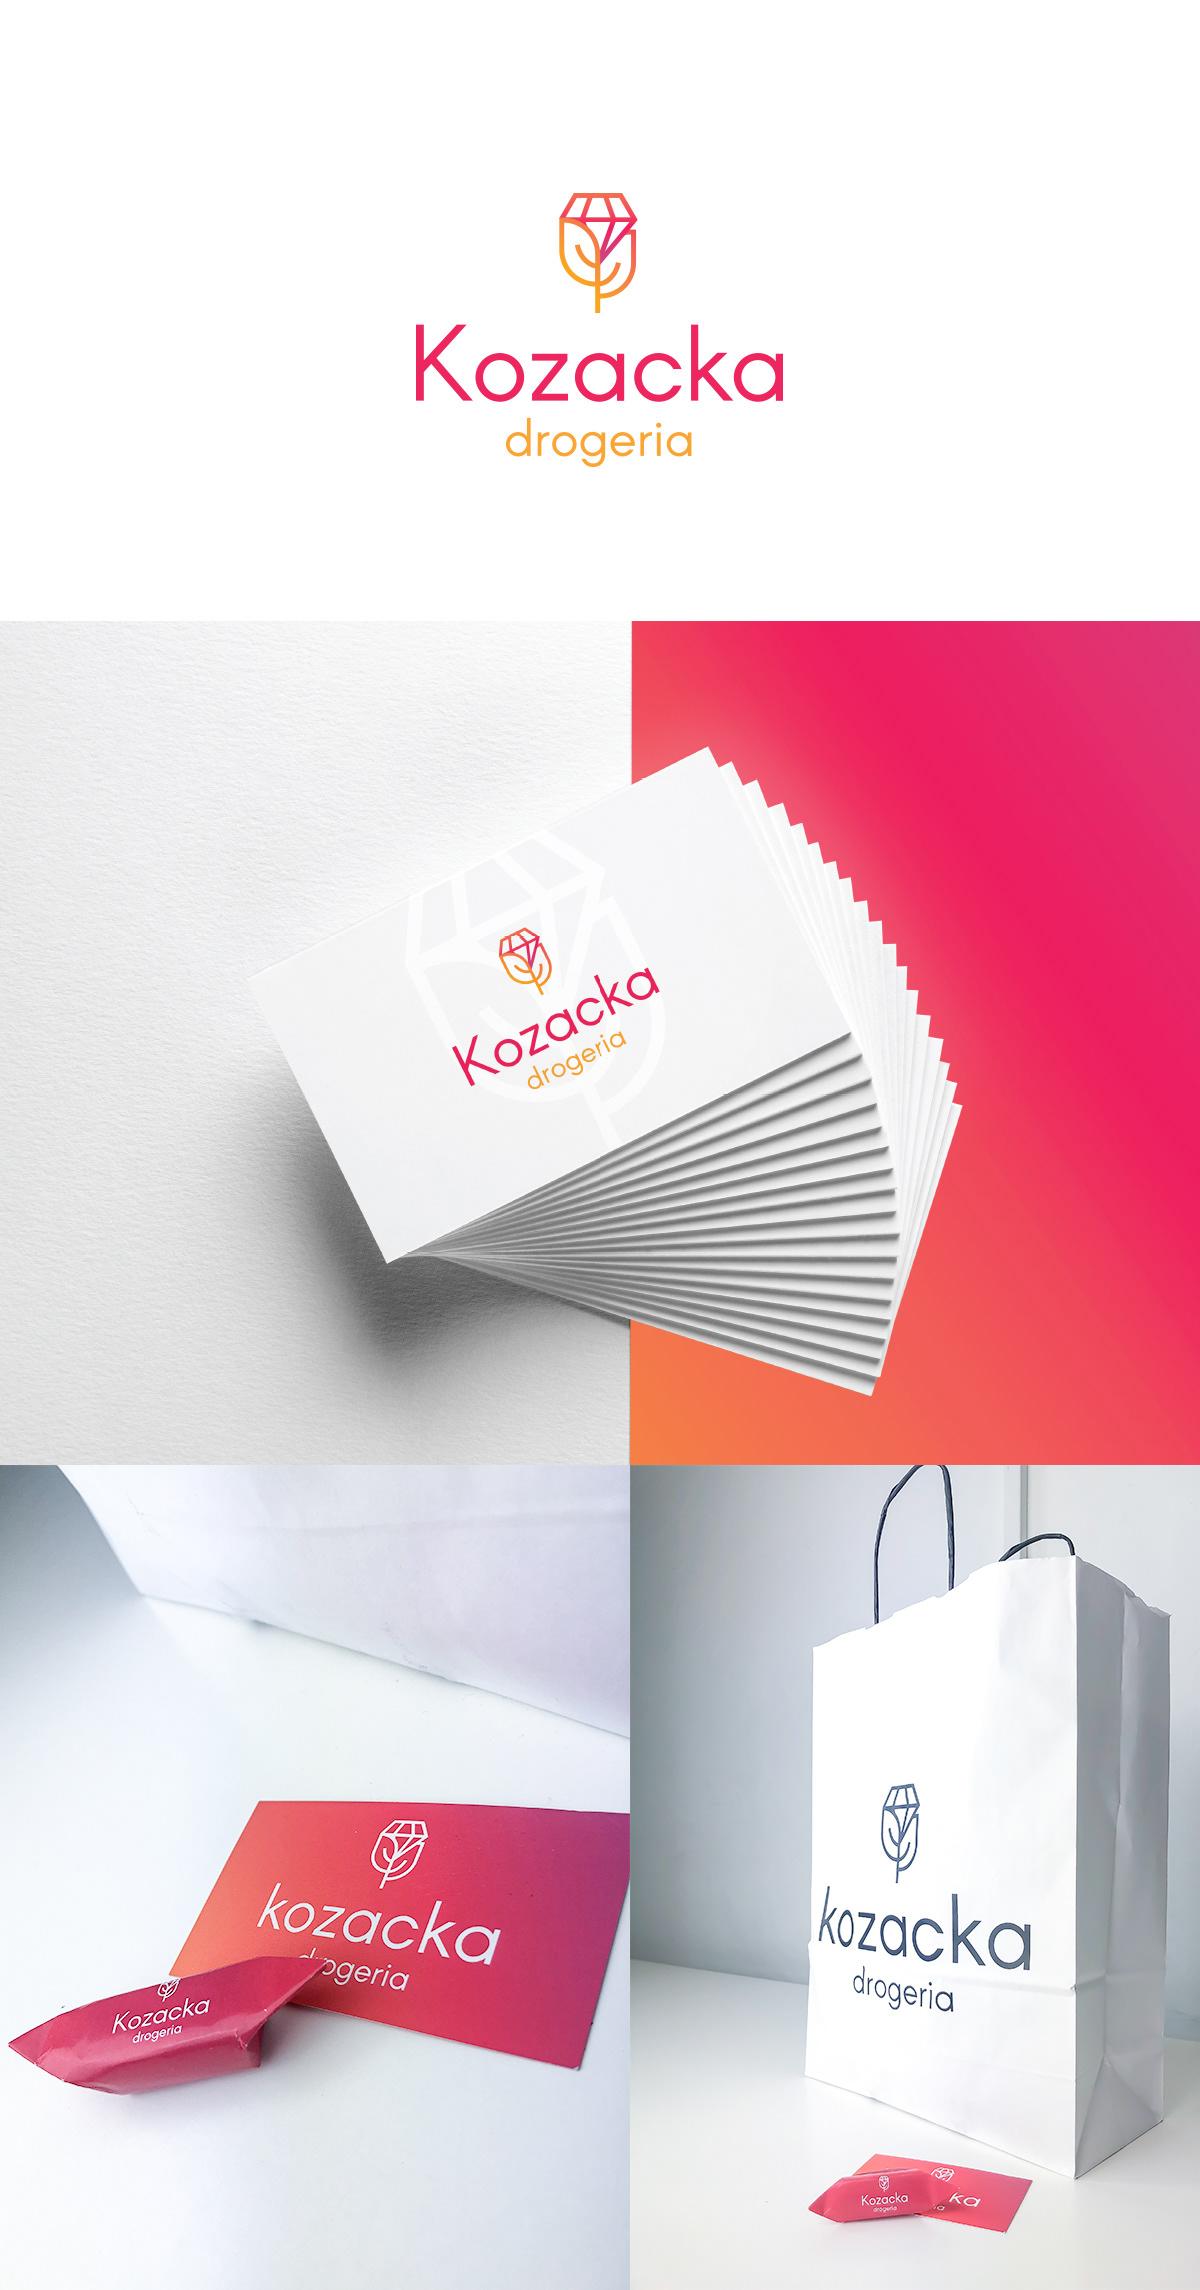 drugstore Online shop cosmetics brand Icon logo perfumery